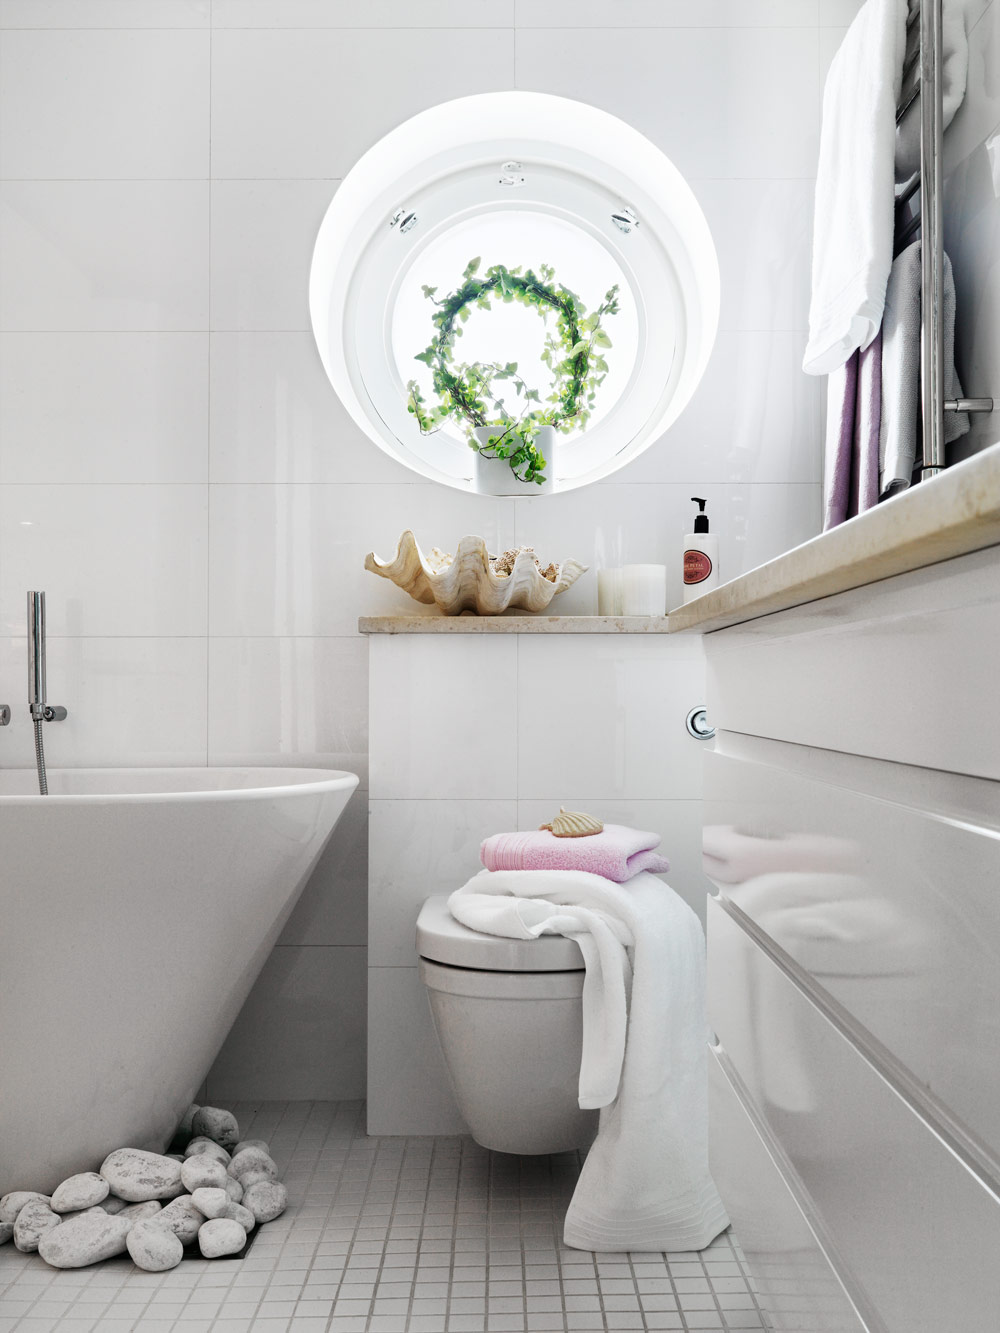 Stylish Small Bathroom With An Unusual Decor | DigsDigs on Small Bathroom Ideas Decor id=14968